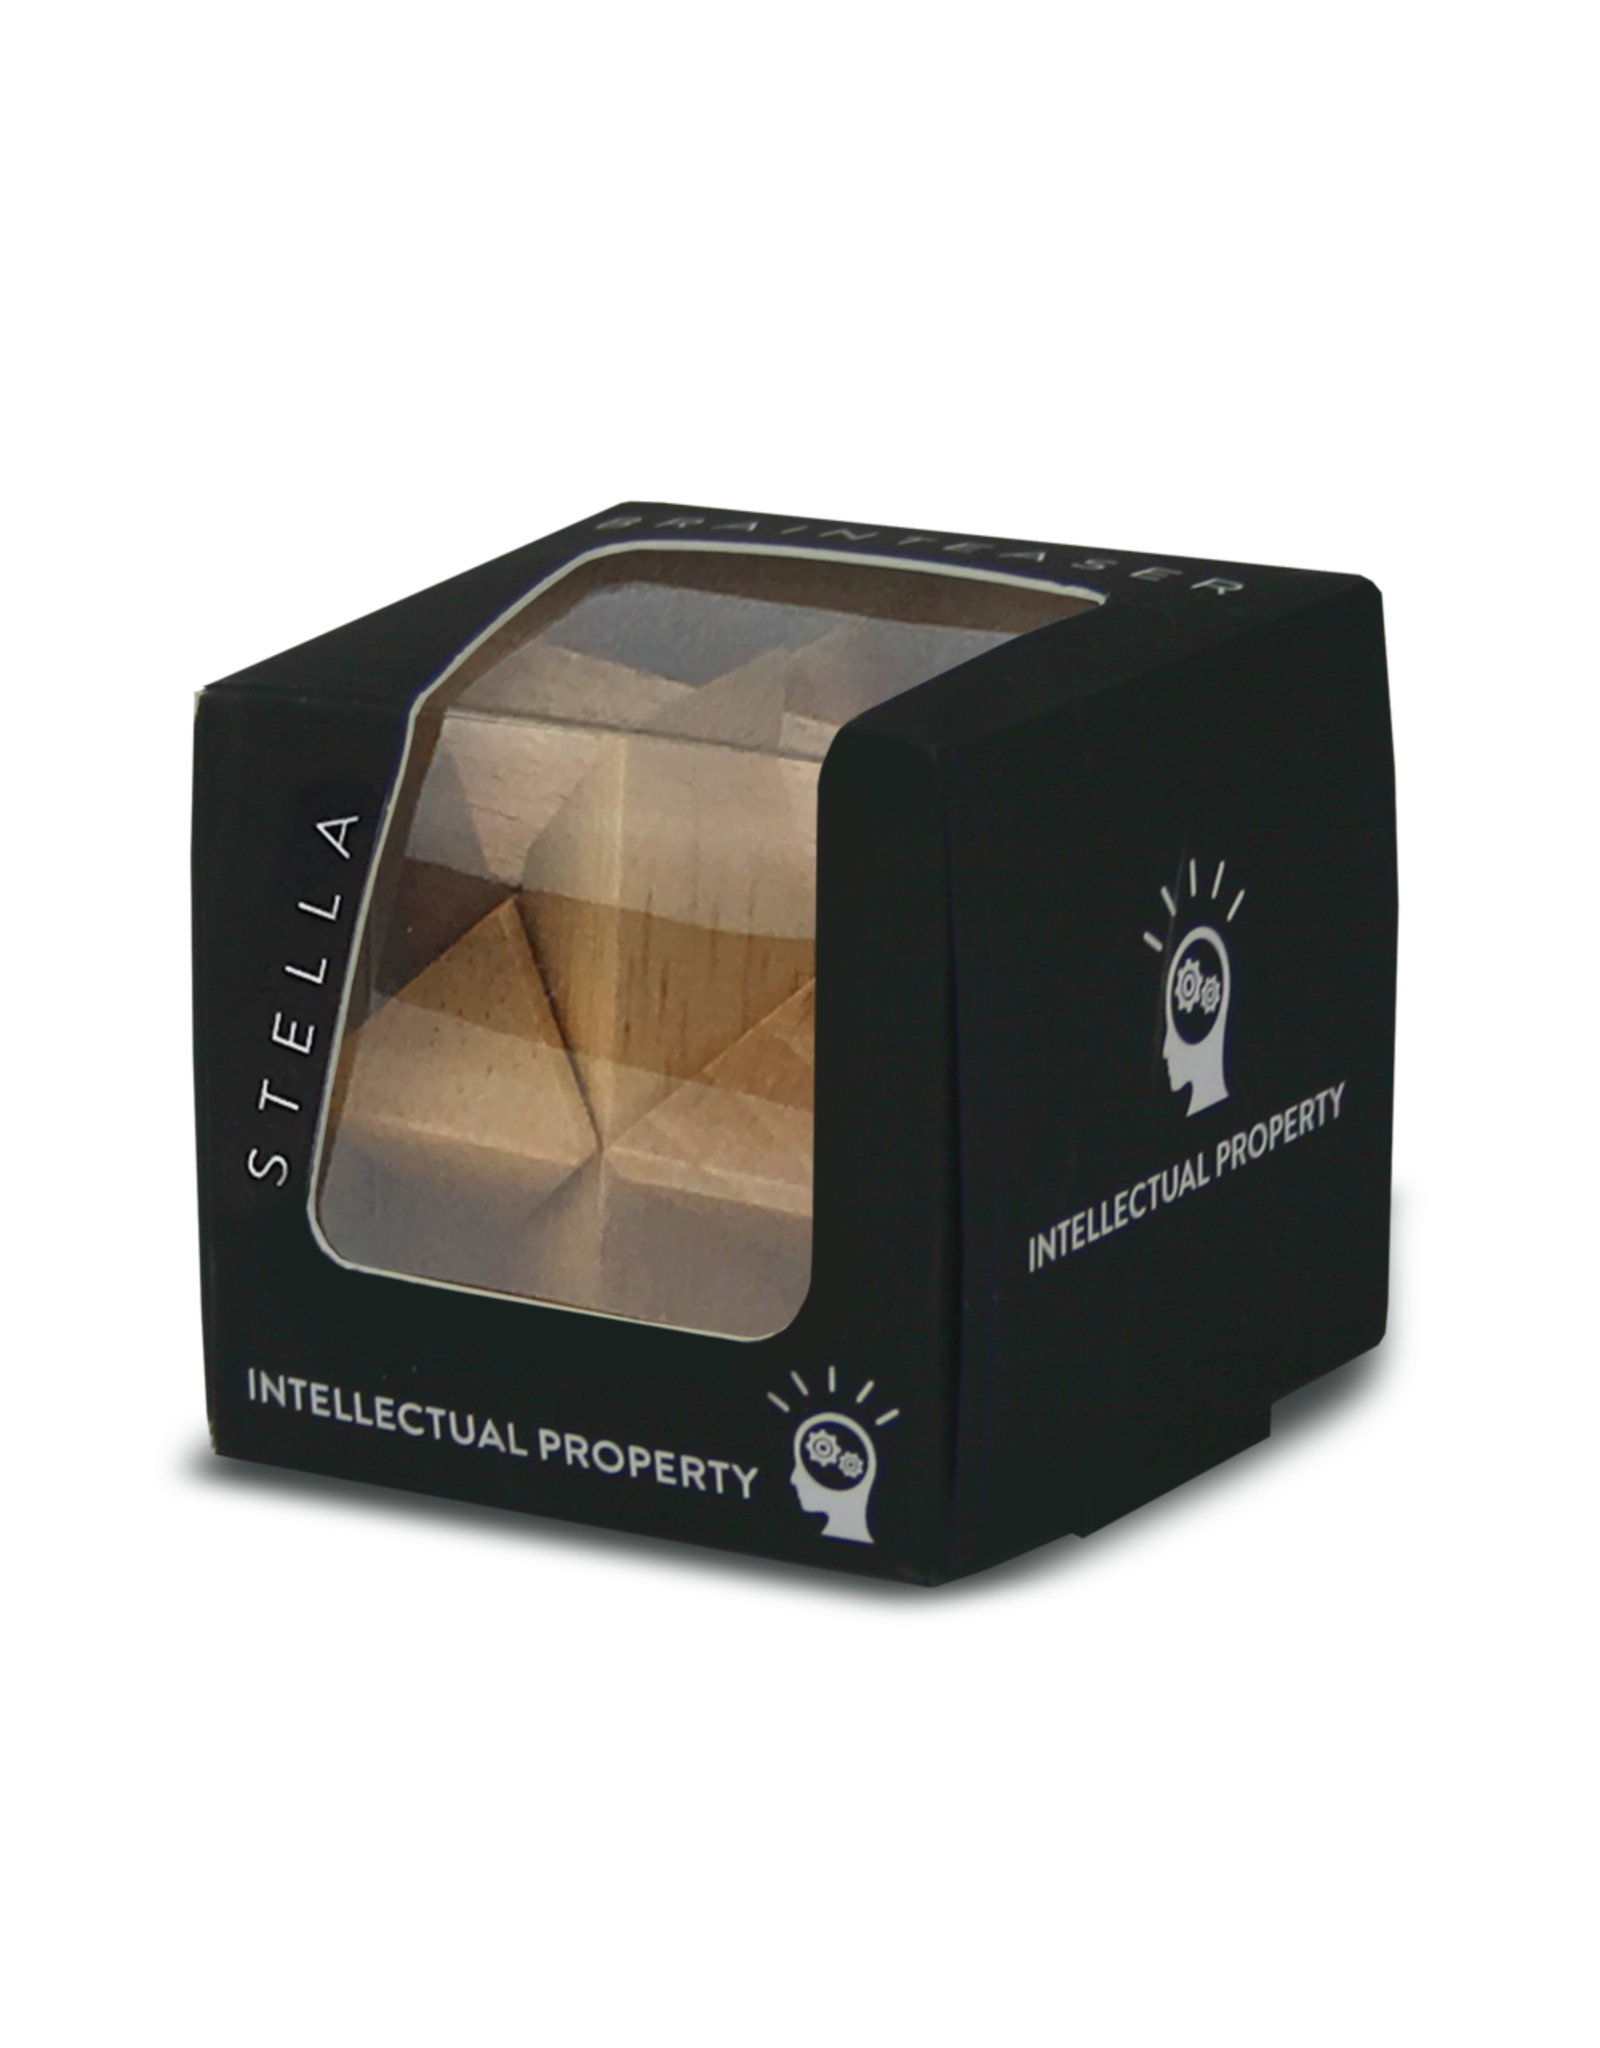 Project Genius Intellectual Property Puzzle: Stella